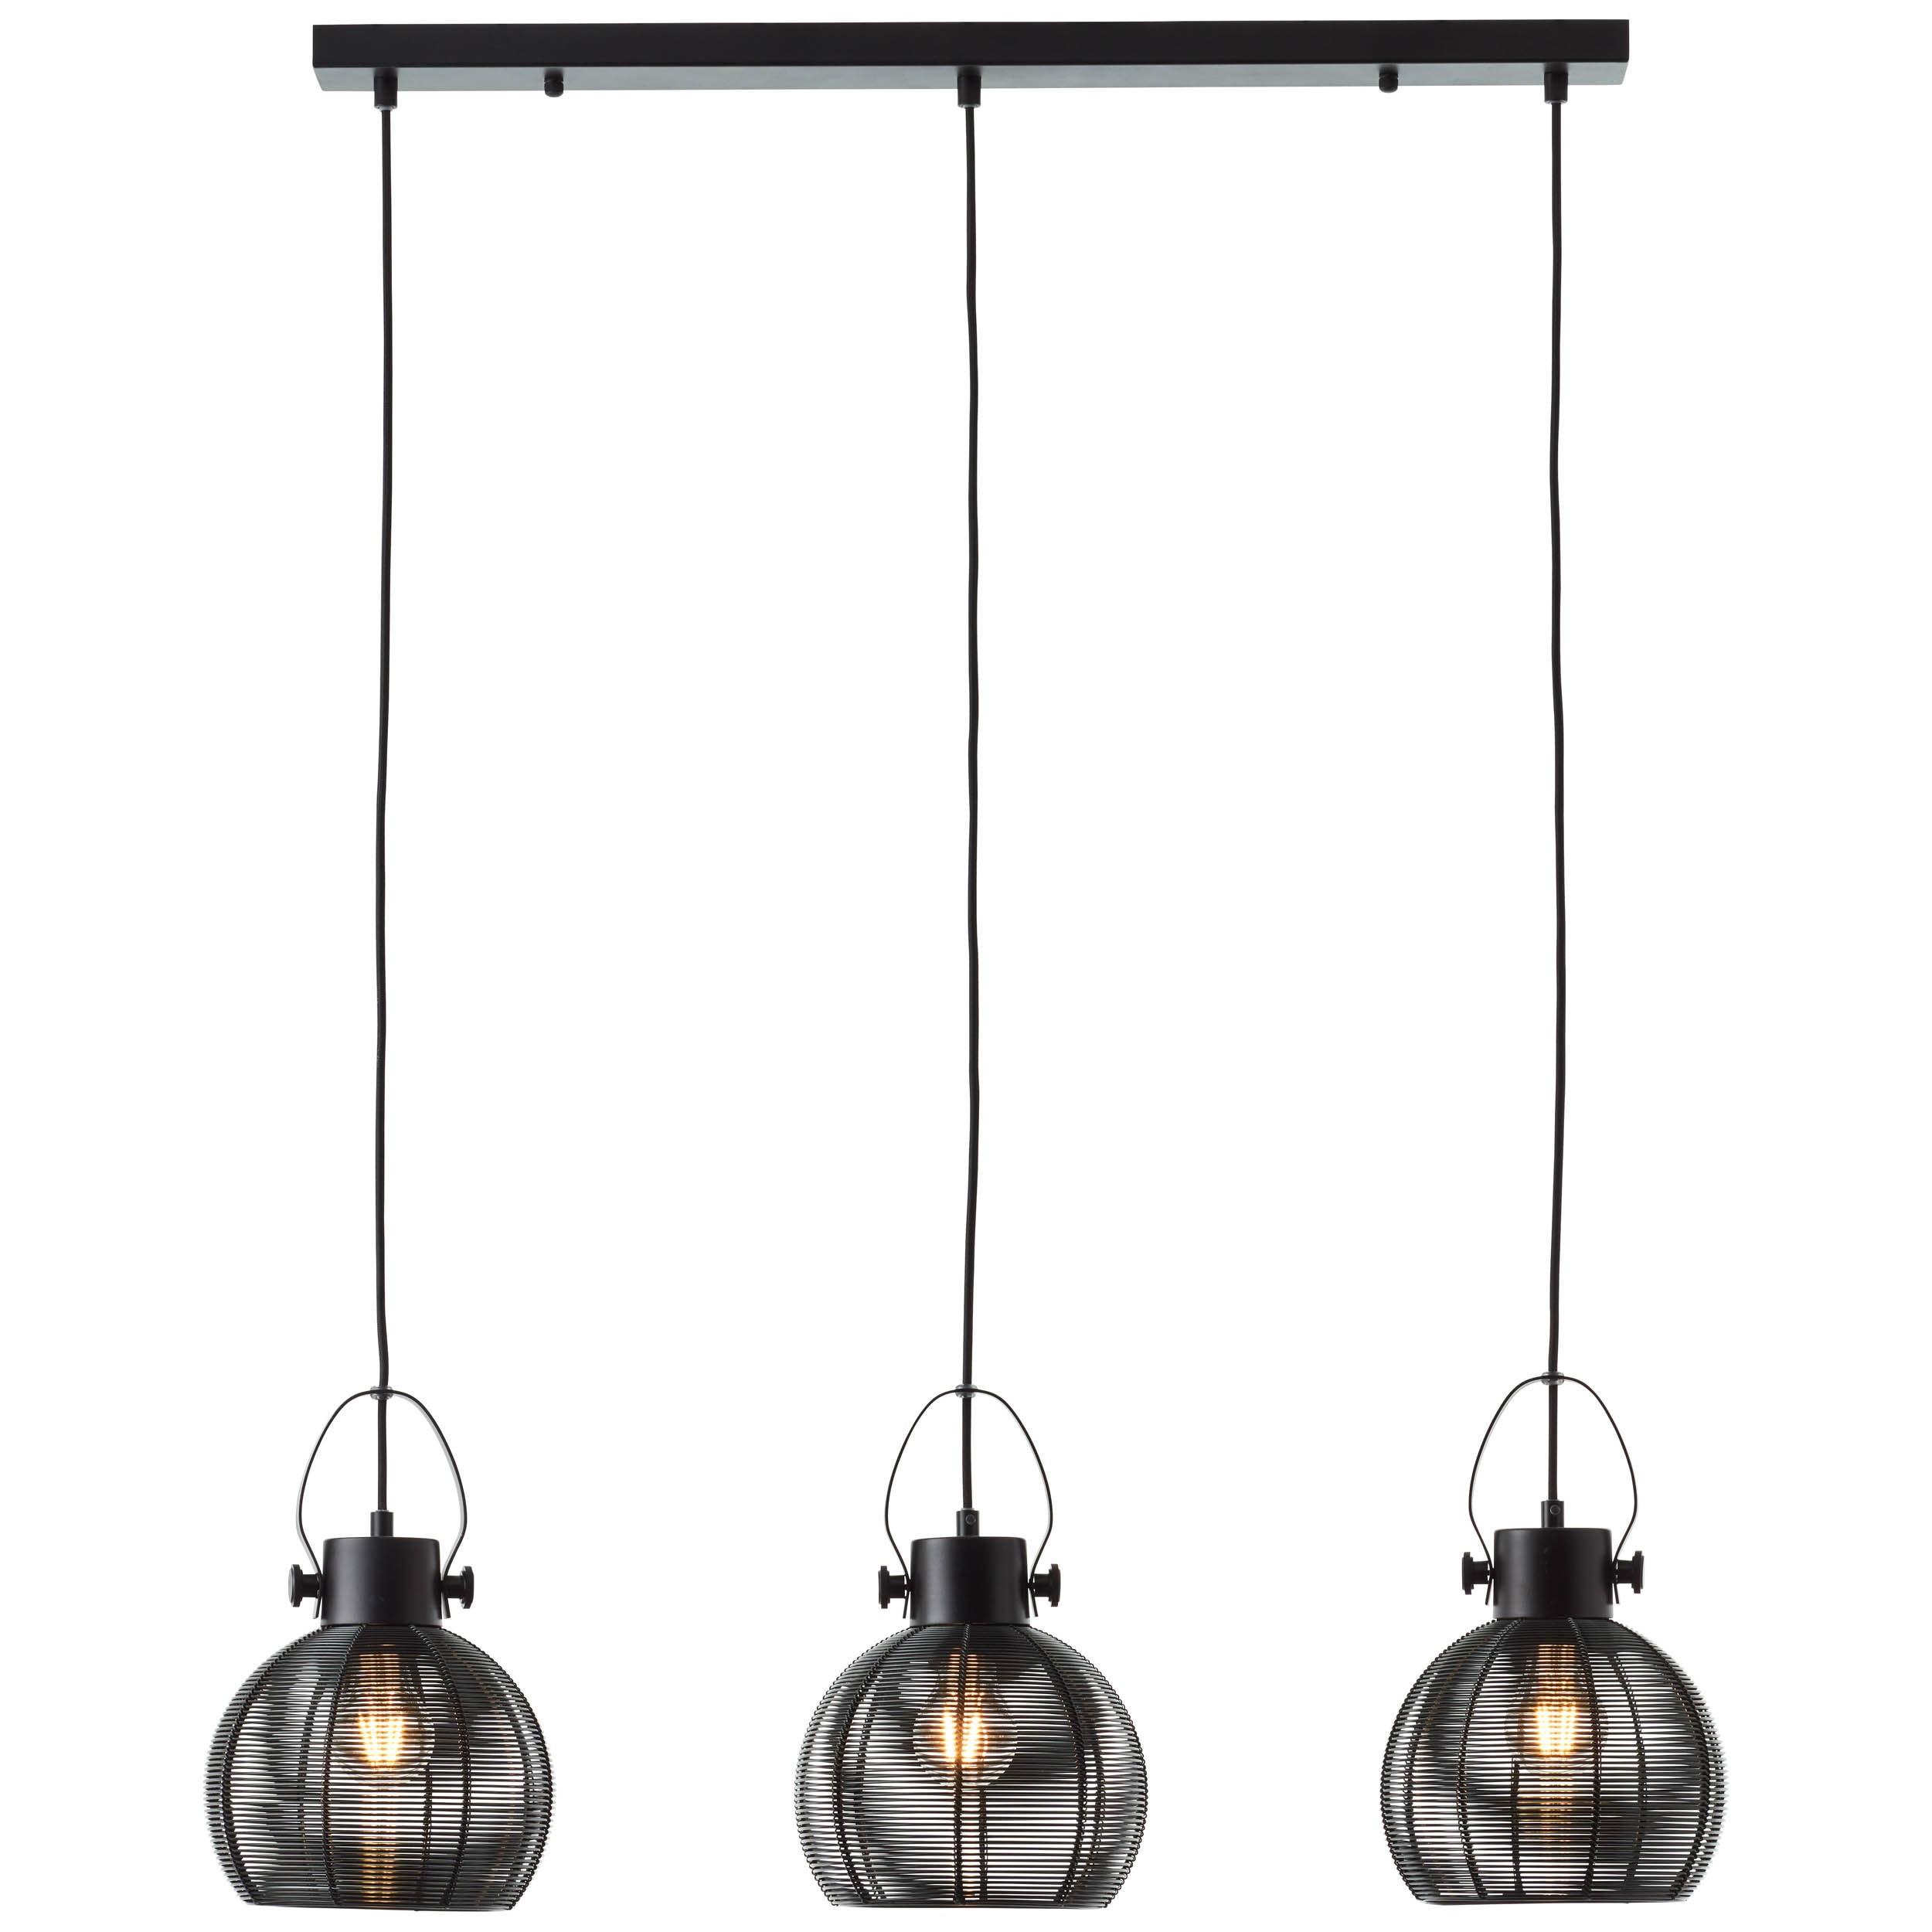 Brilliant Leuchten Sambo Pendelleuchte 3flg Reihe schwarz